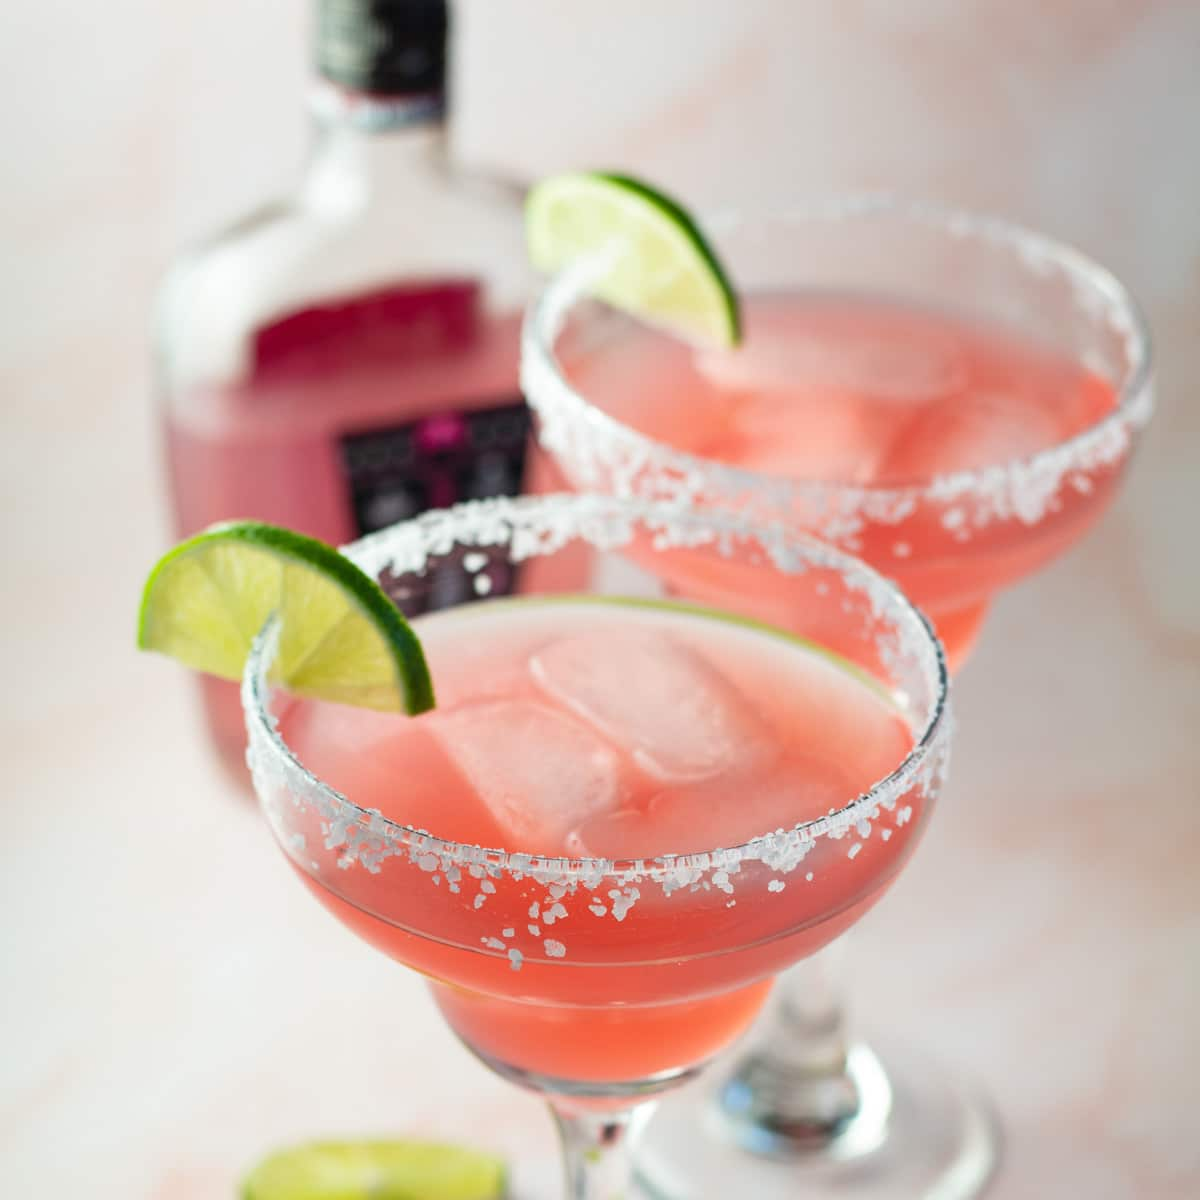 Pink vodka margarita serve din margarita glasses with lemon slice on rim.